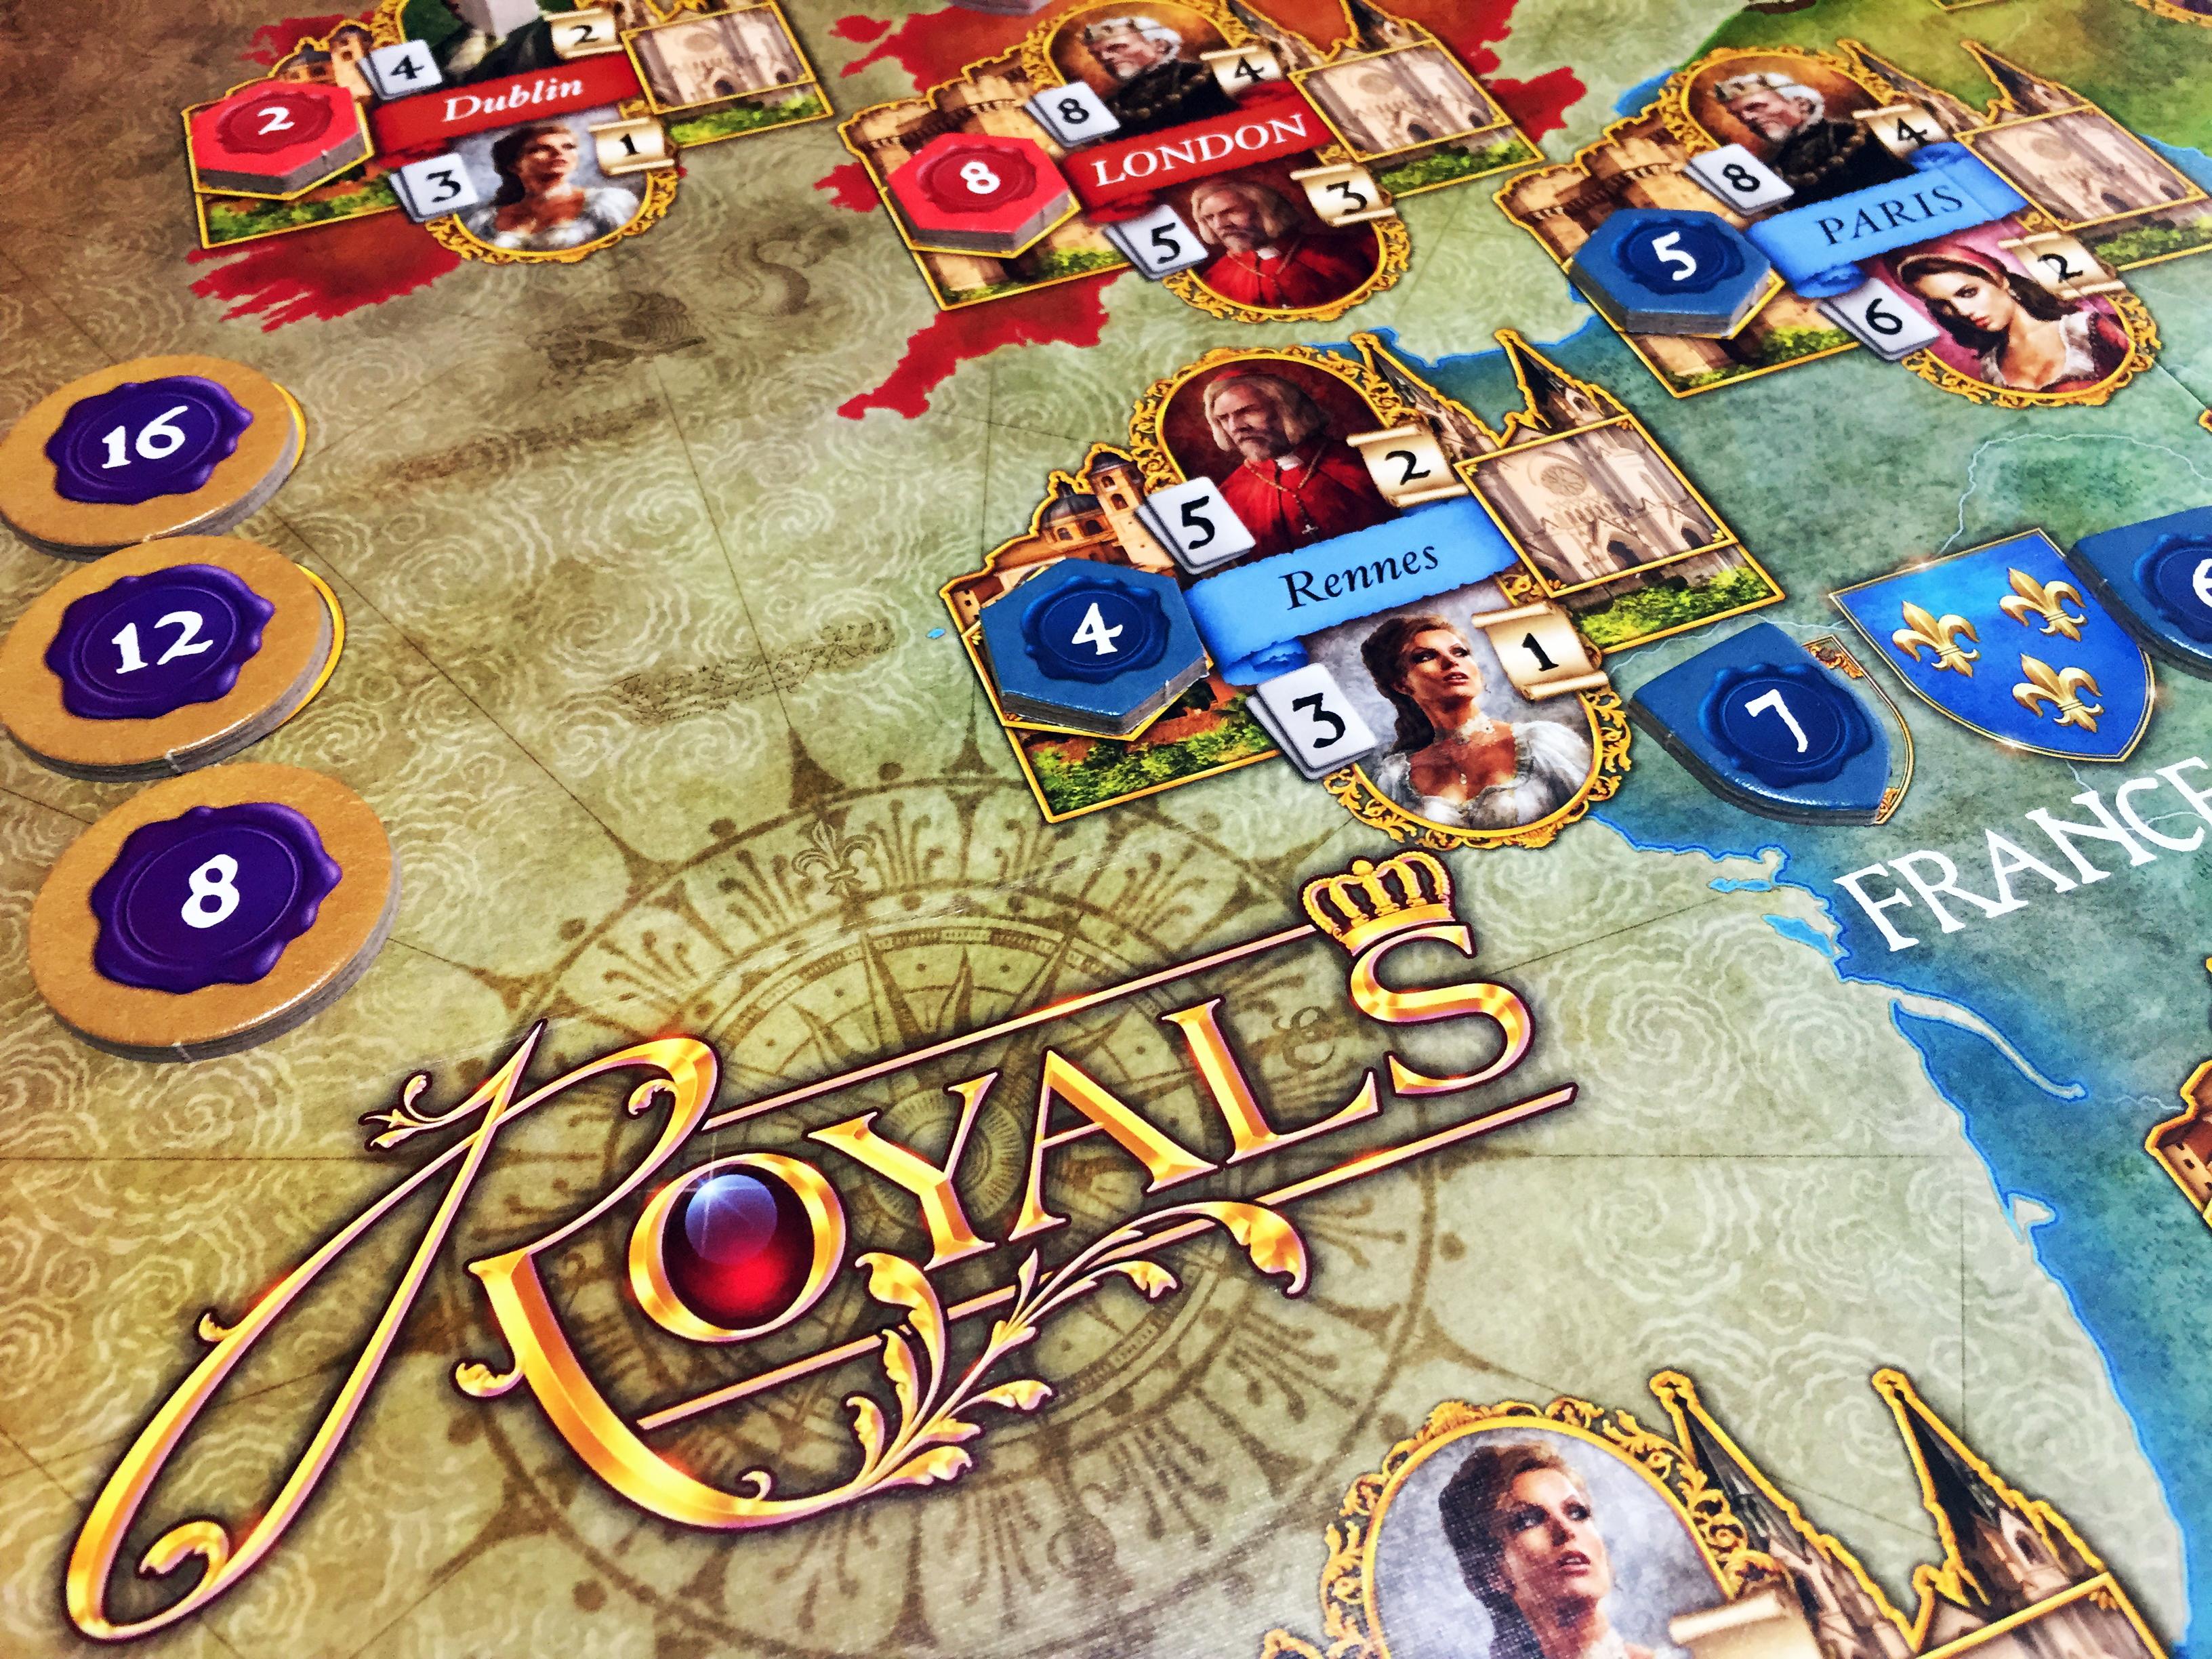 royals video game addiction